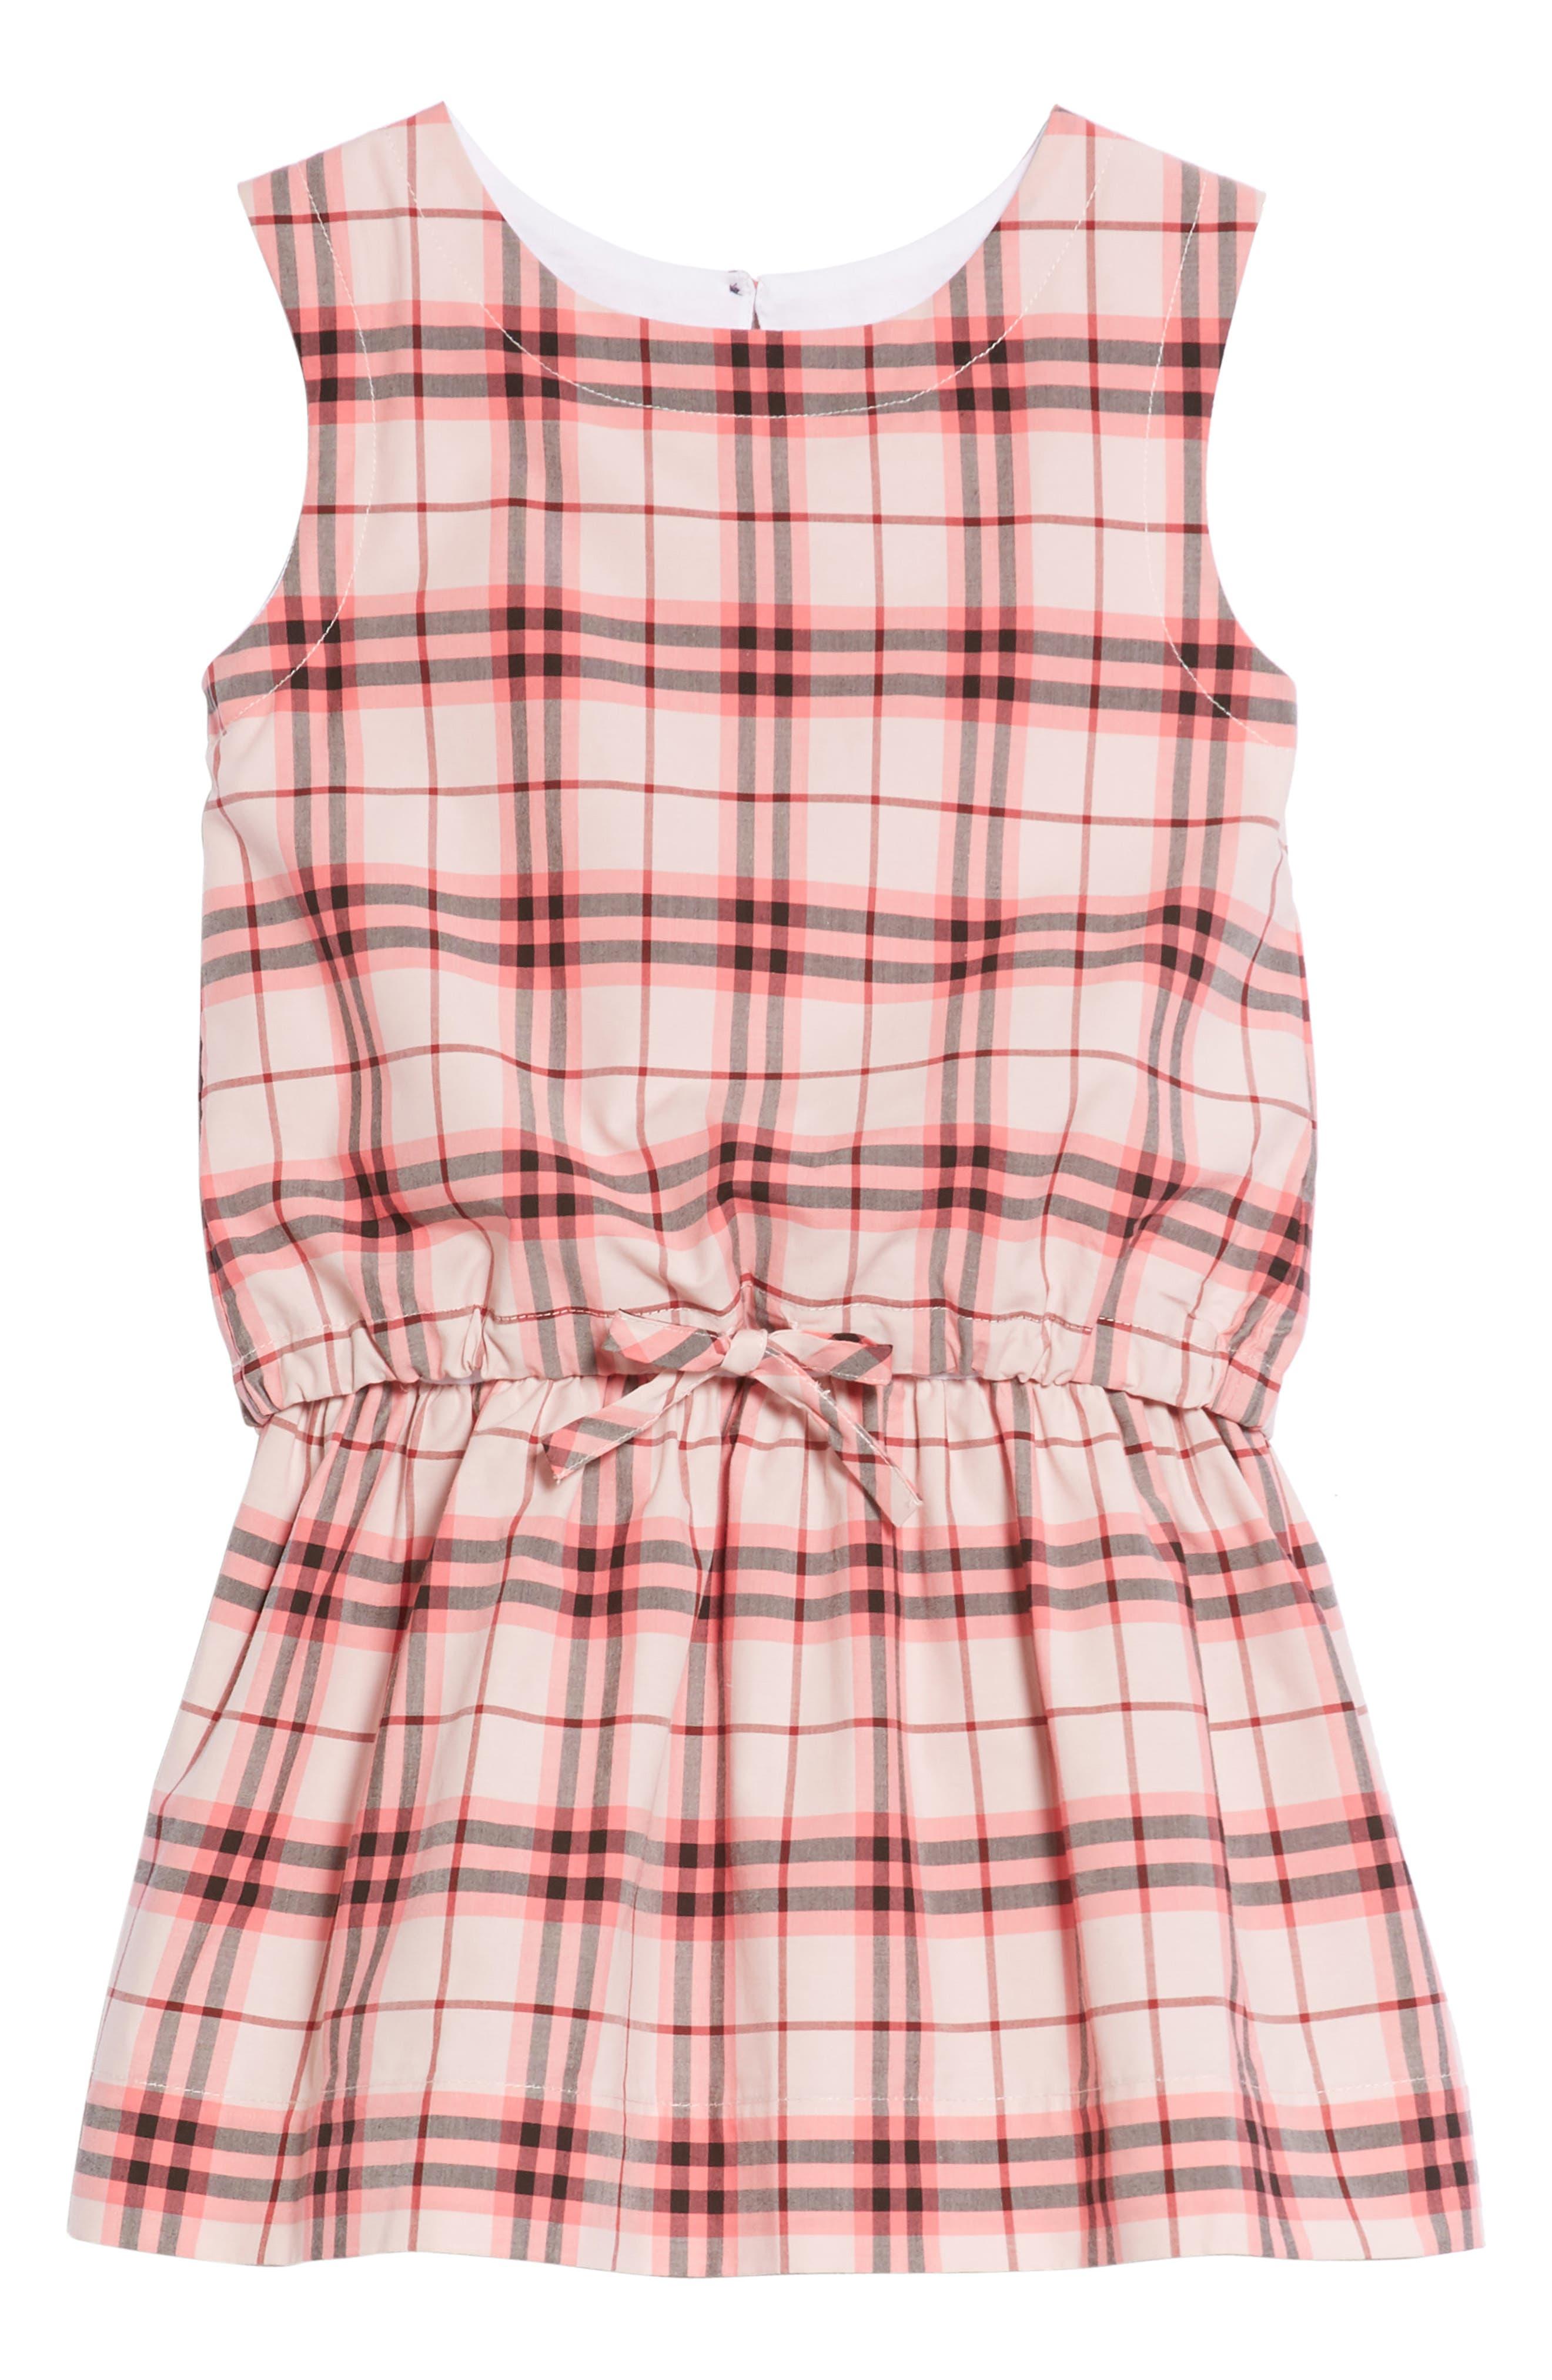 Burberry Mabel Check Dress (Toddler Girls)